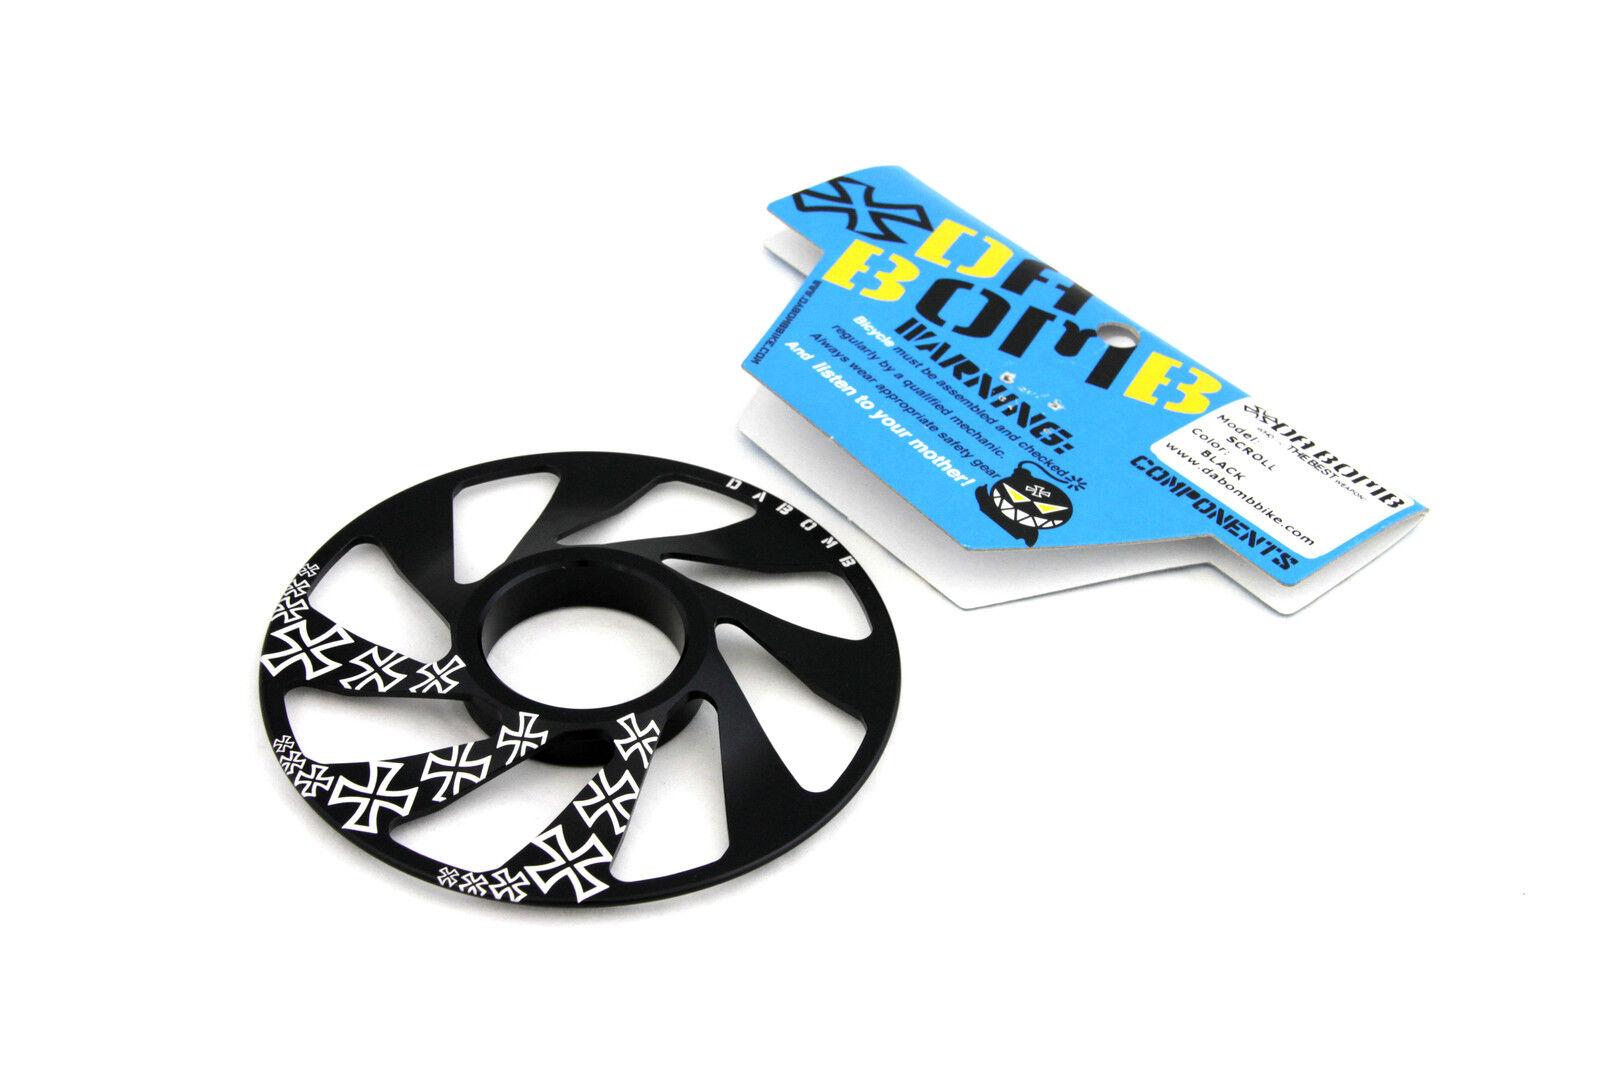 DaBomb Scroll 10 velocidad a 7 Velocidad Converdeidor Para Shimano  Cassette-Negro  soporte minorista mayorista